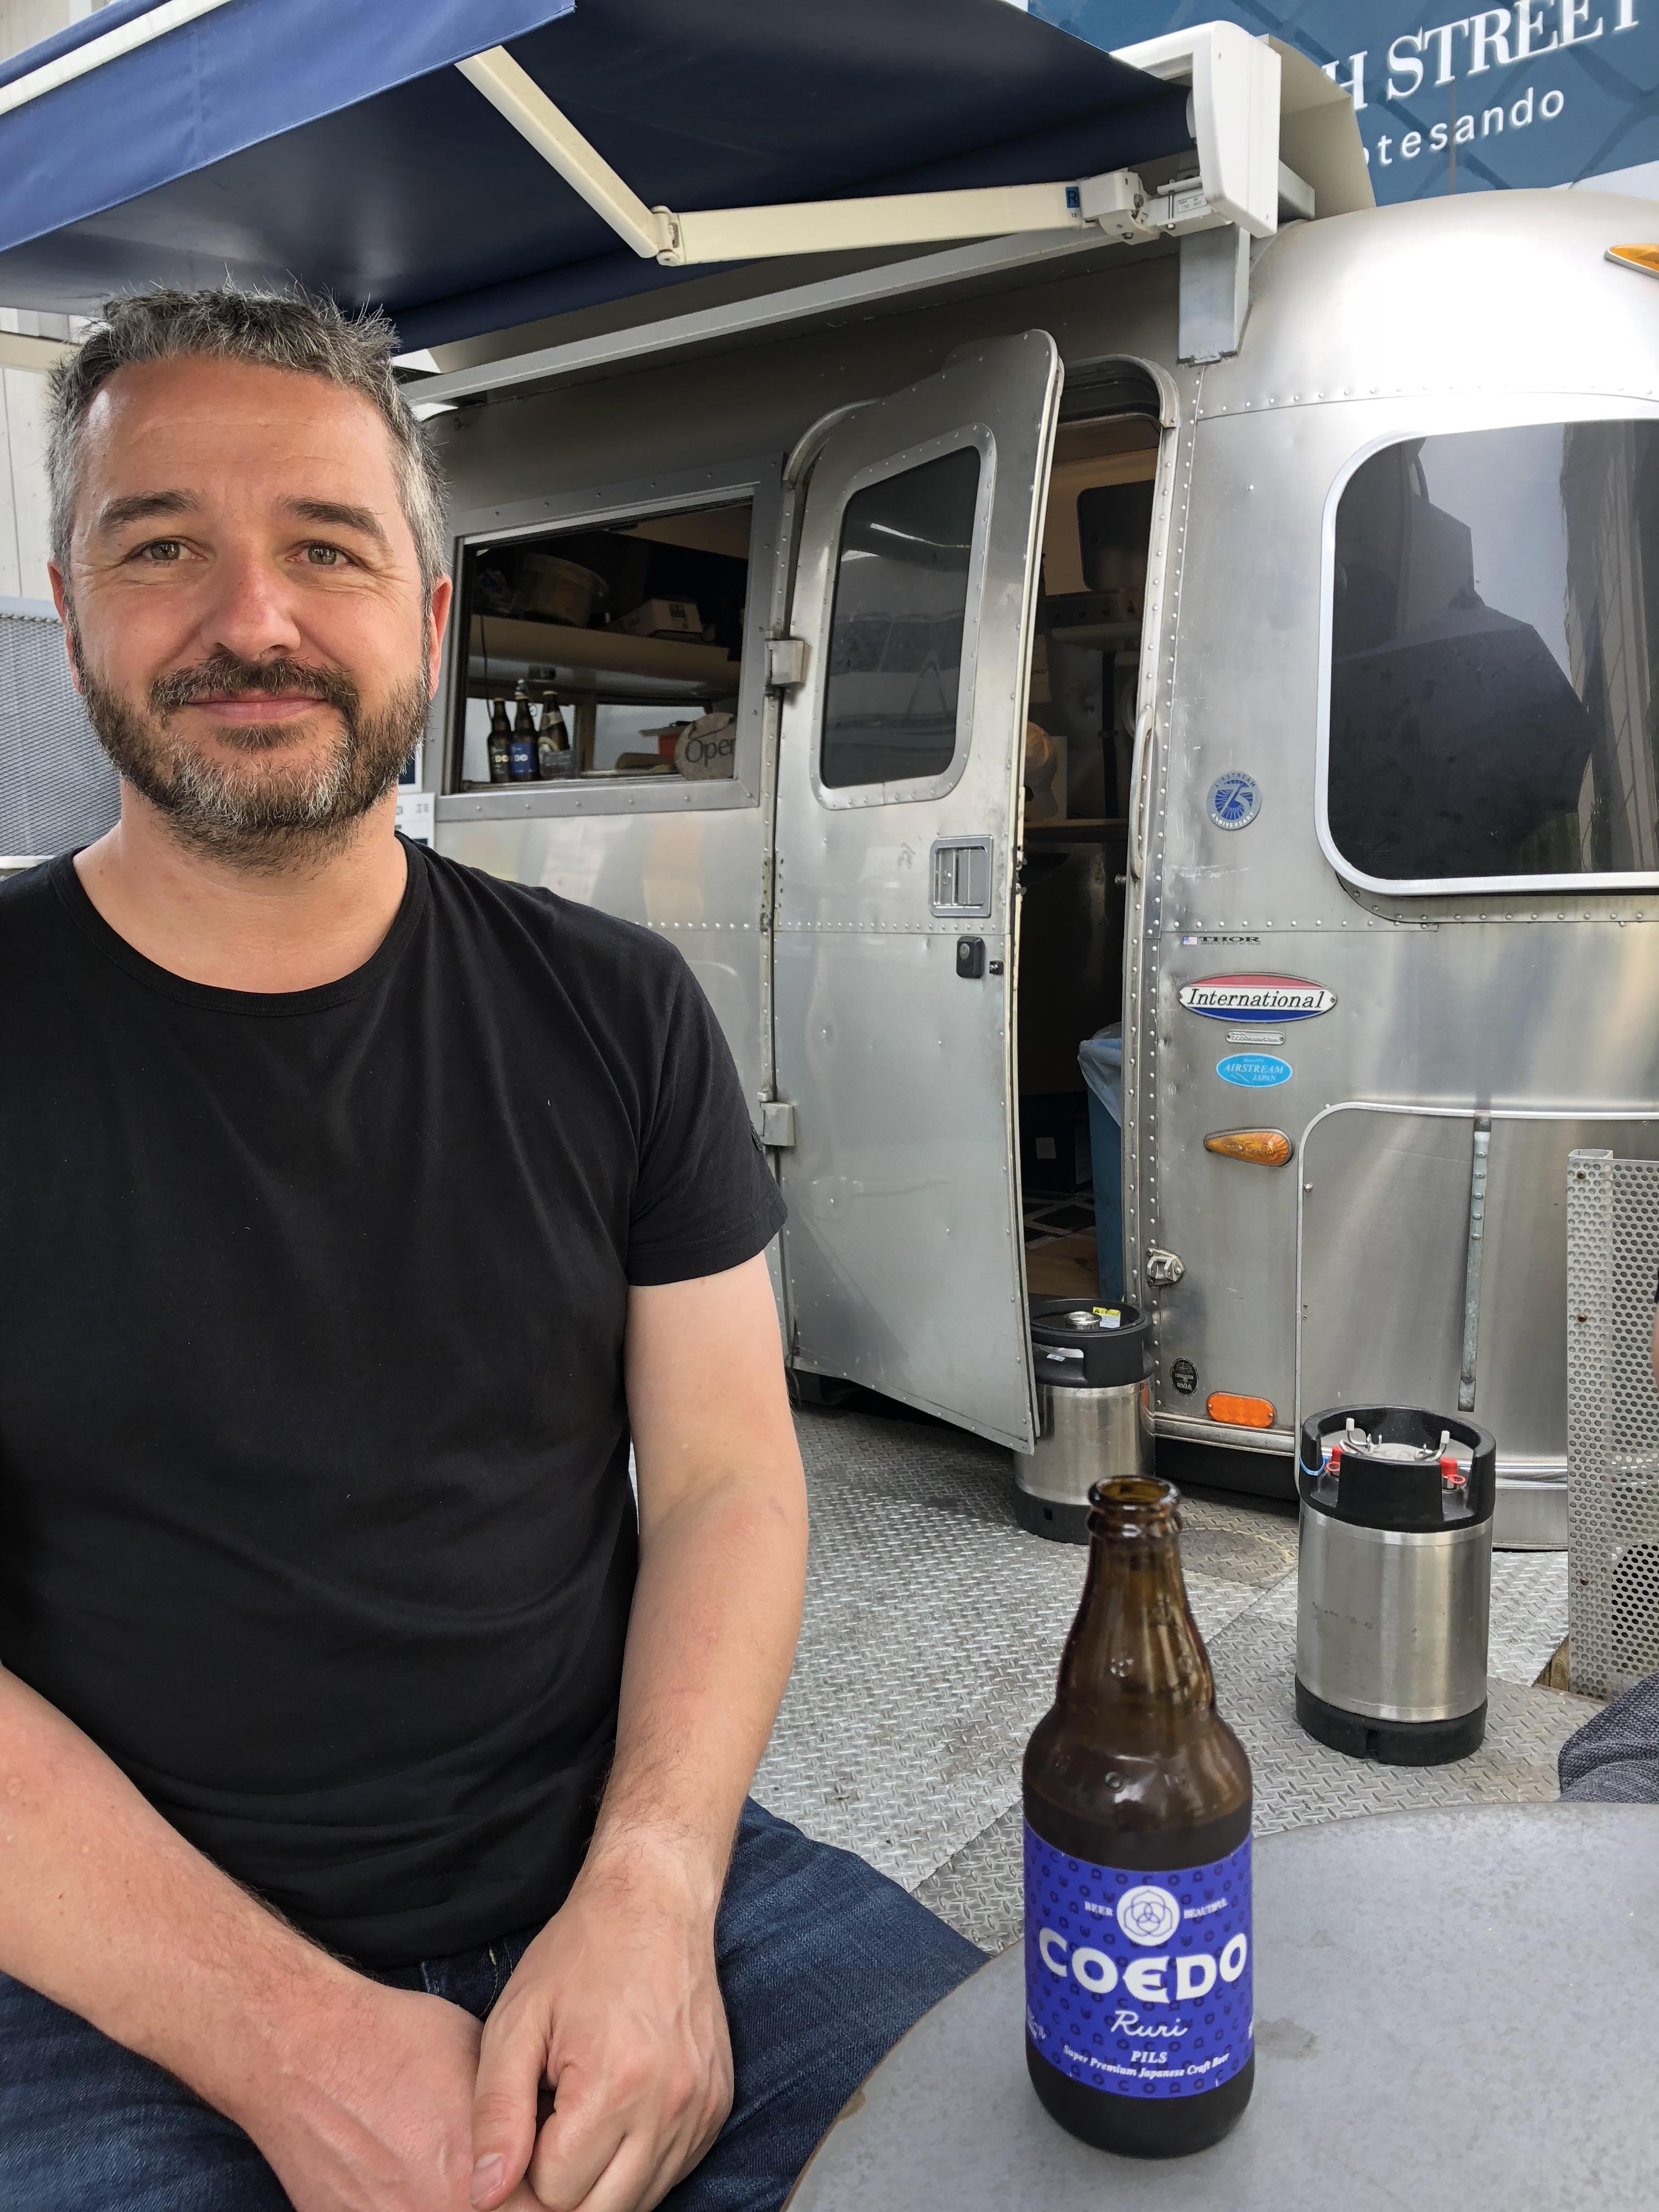 Super Sake Boy drinking a Coedo Beer in Harajuku in Japan, in front of an Airstream caravan